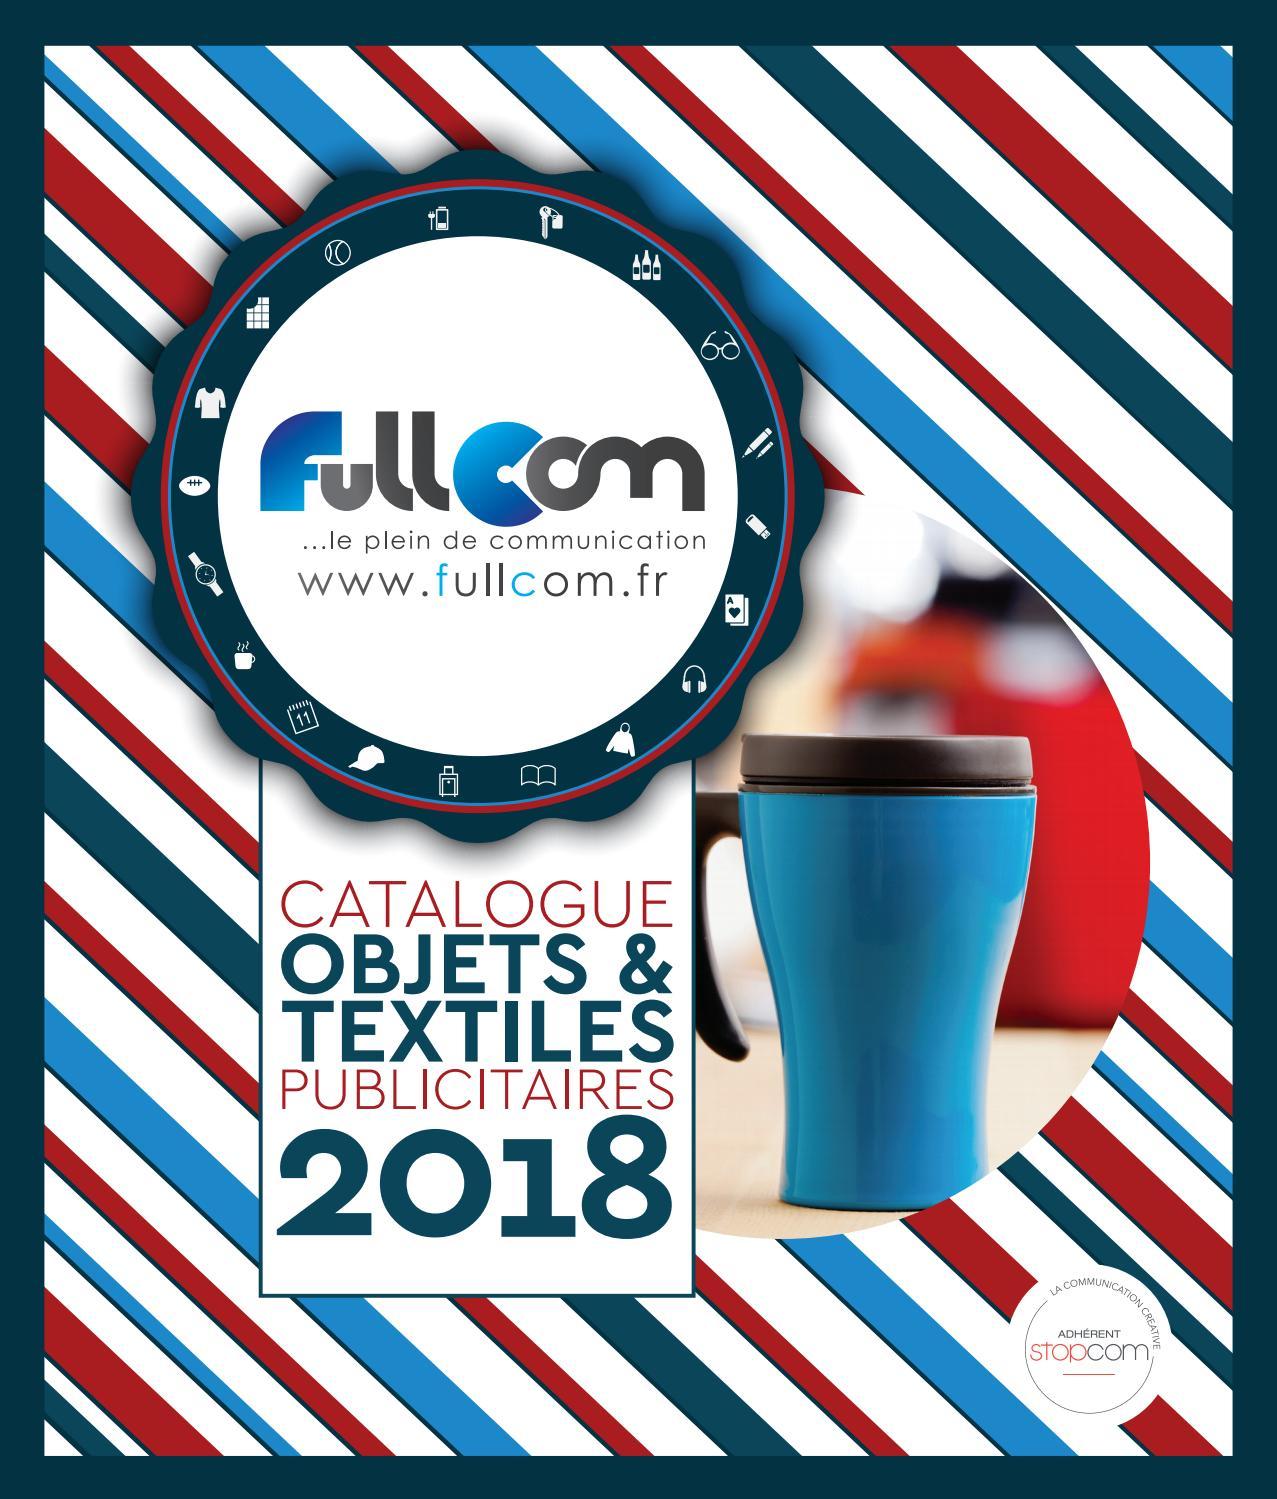 5f2f36c832 Objectif Fullcom By Goodies Issuu 2018 E2IYDHW9e